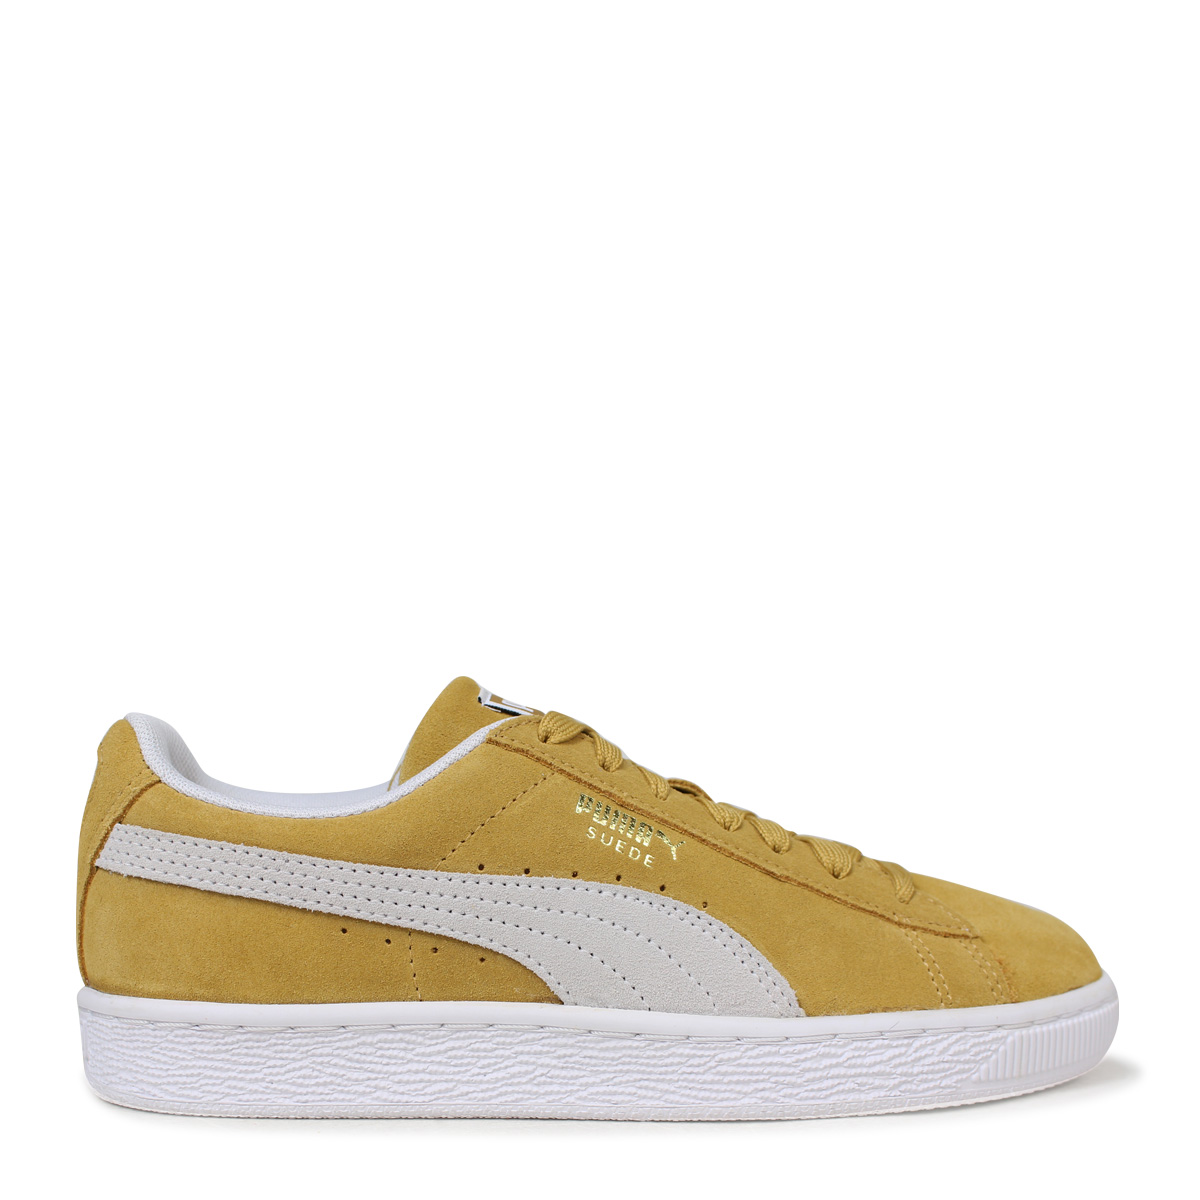 PUMA SUEDE CLASSIC Puma suede classical music sneakers men gap Dis 365,347 10 yellow